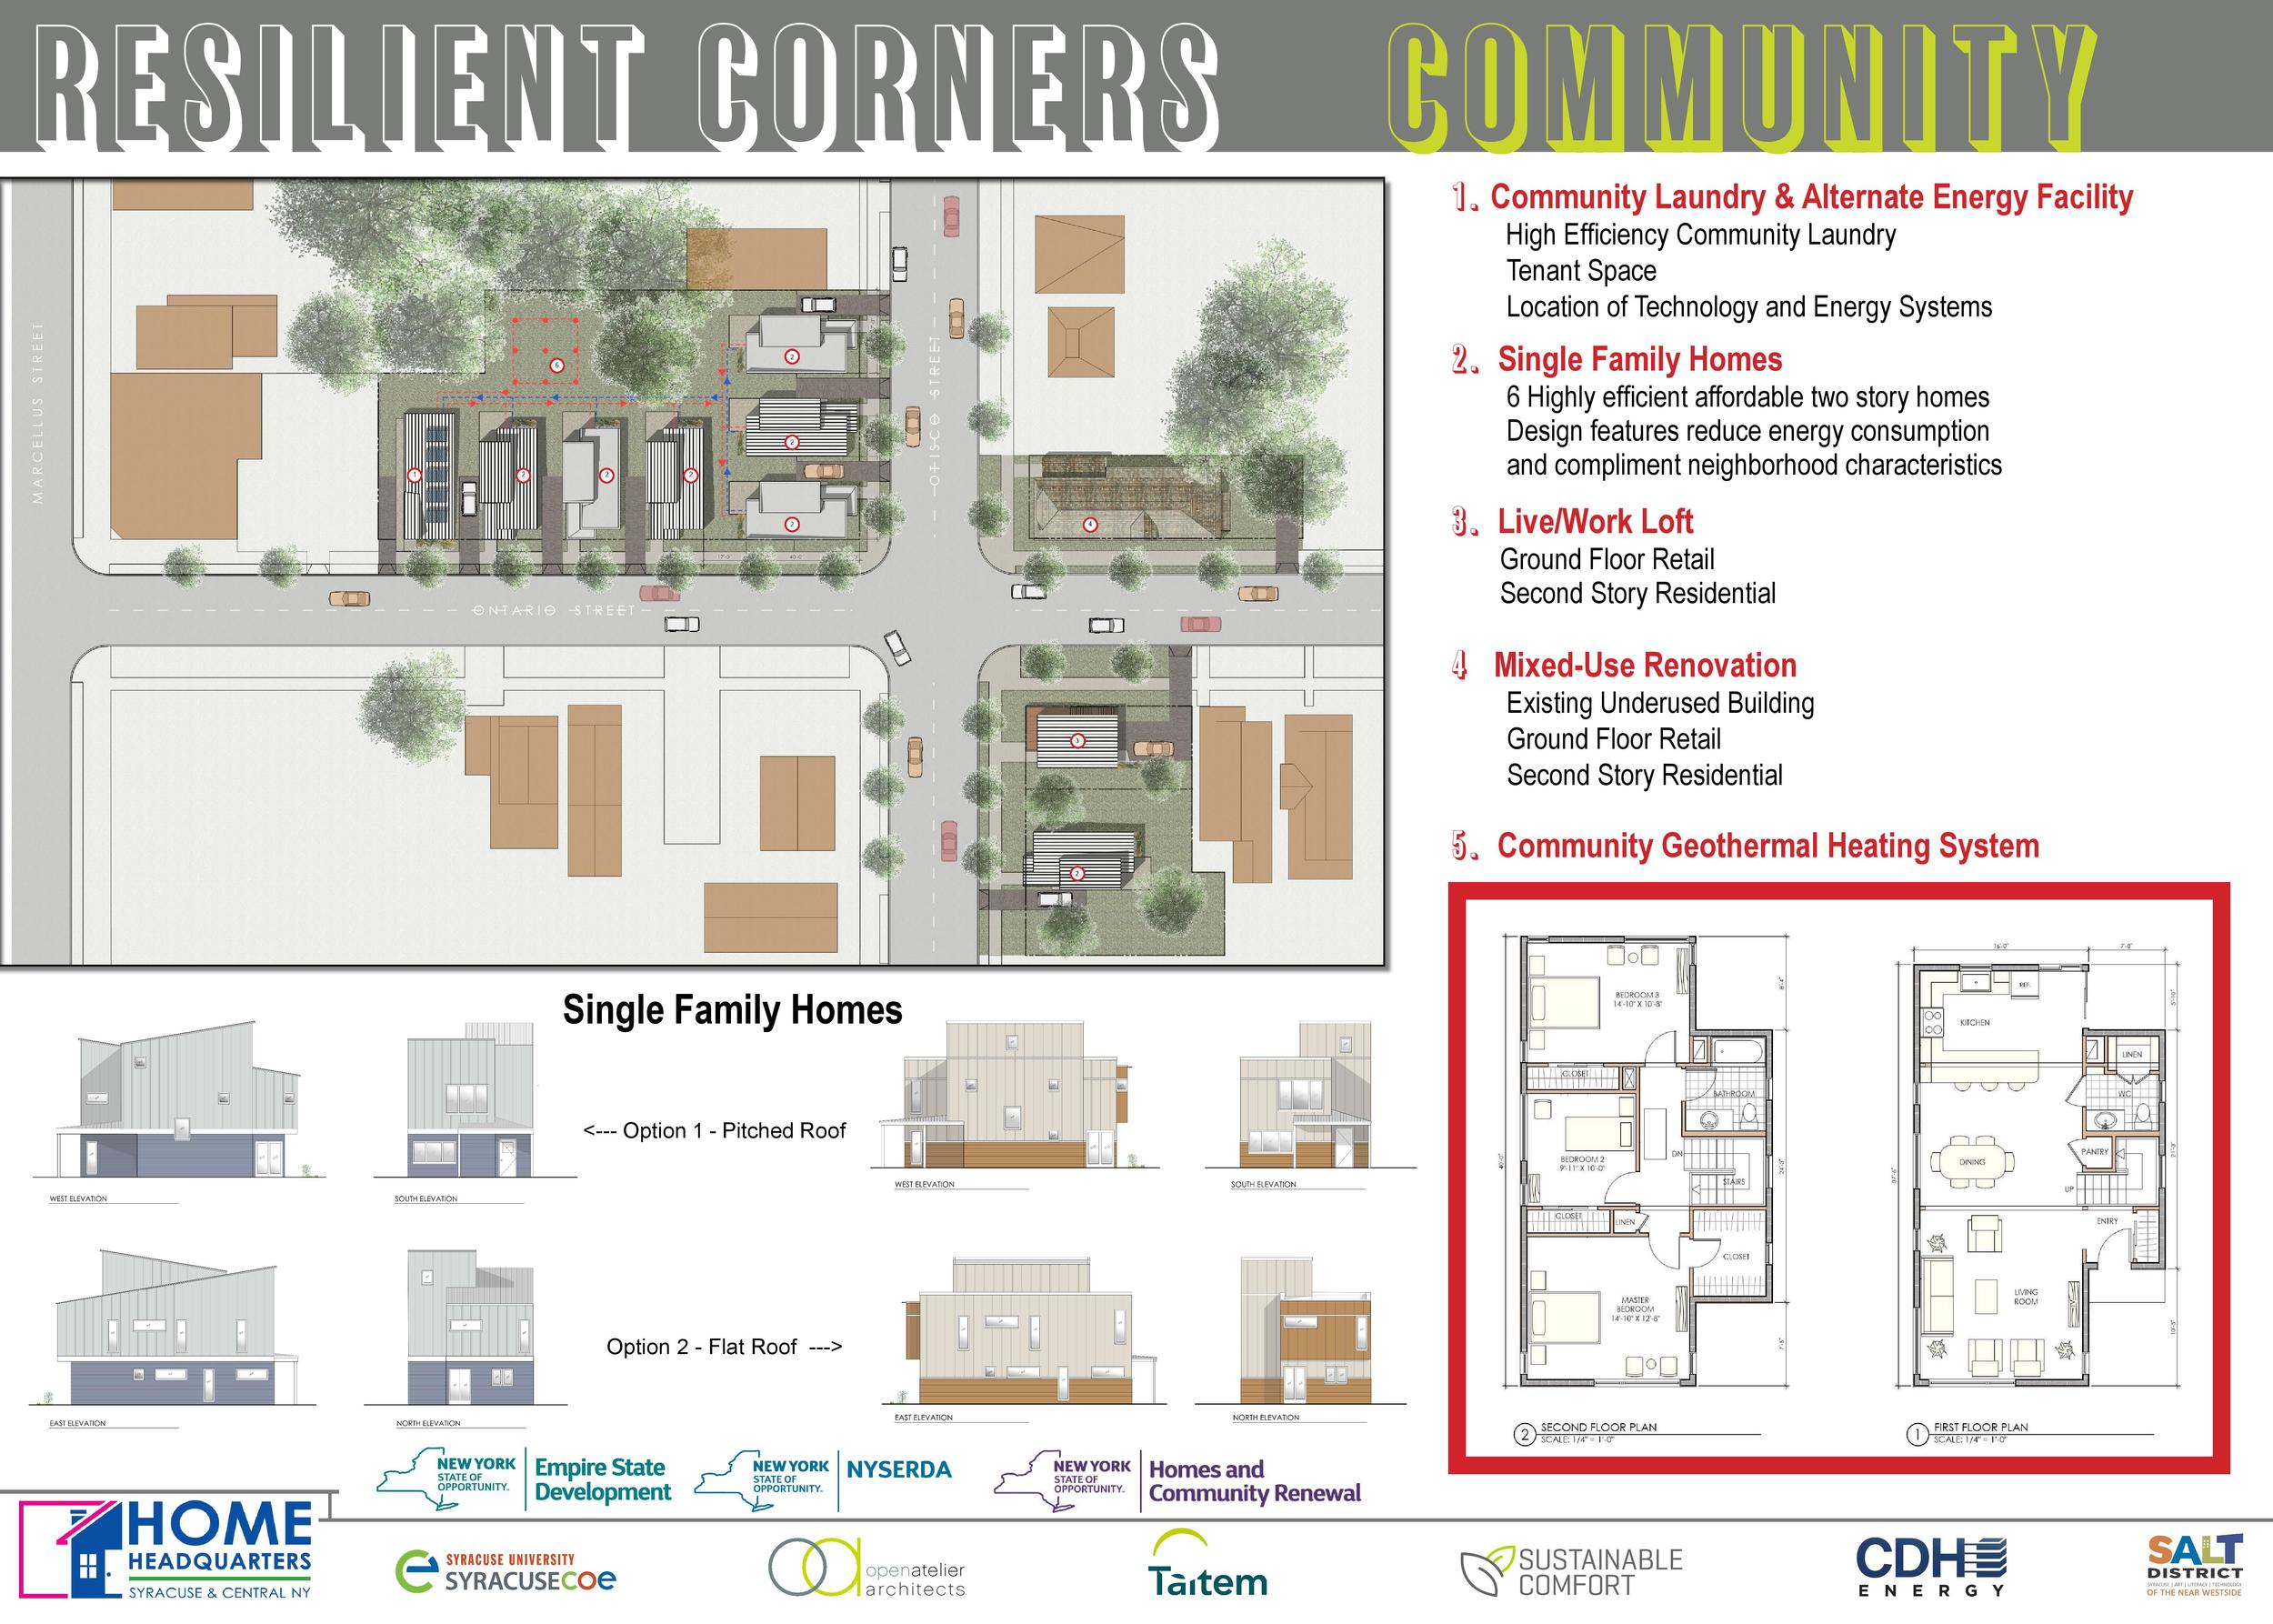 Resilient Corners Board Commuity Final-page-001.jpg